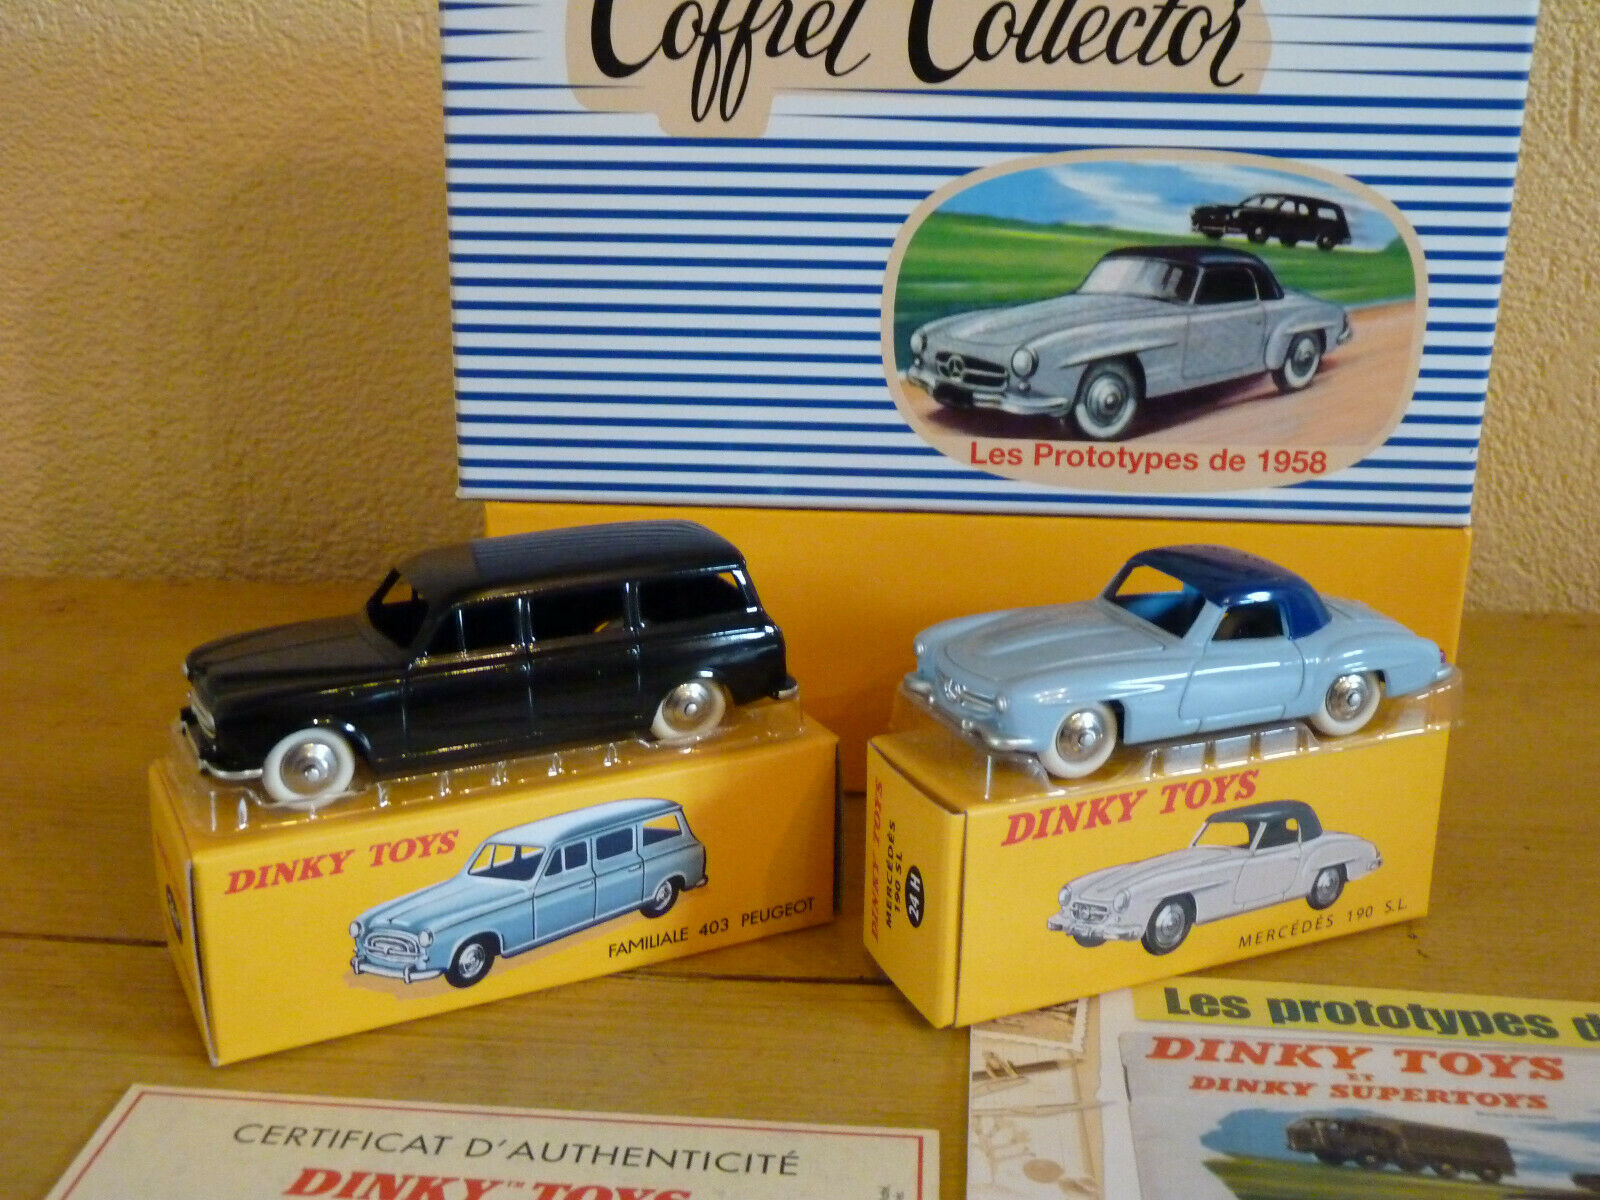 Coffret collector Les prossootypes de 1958  ref ref ref 24 FH au 1 43 de dinky giocattoli atlas 96fbf8